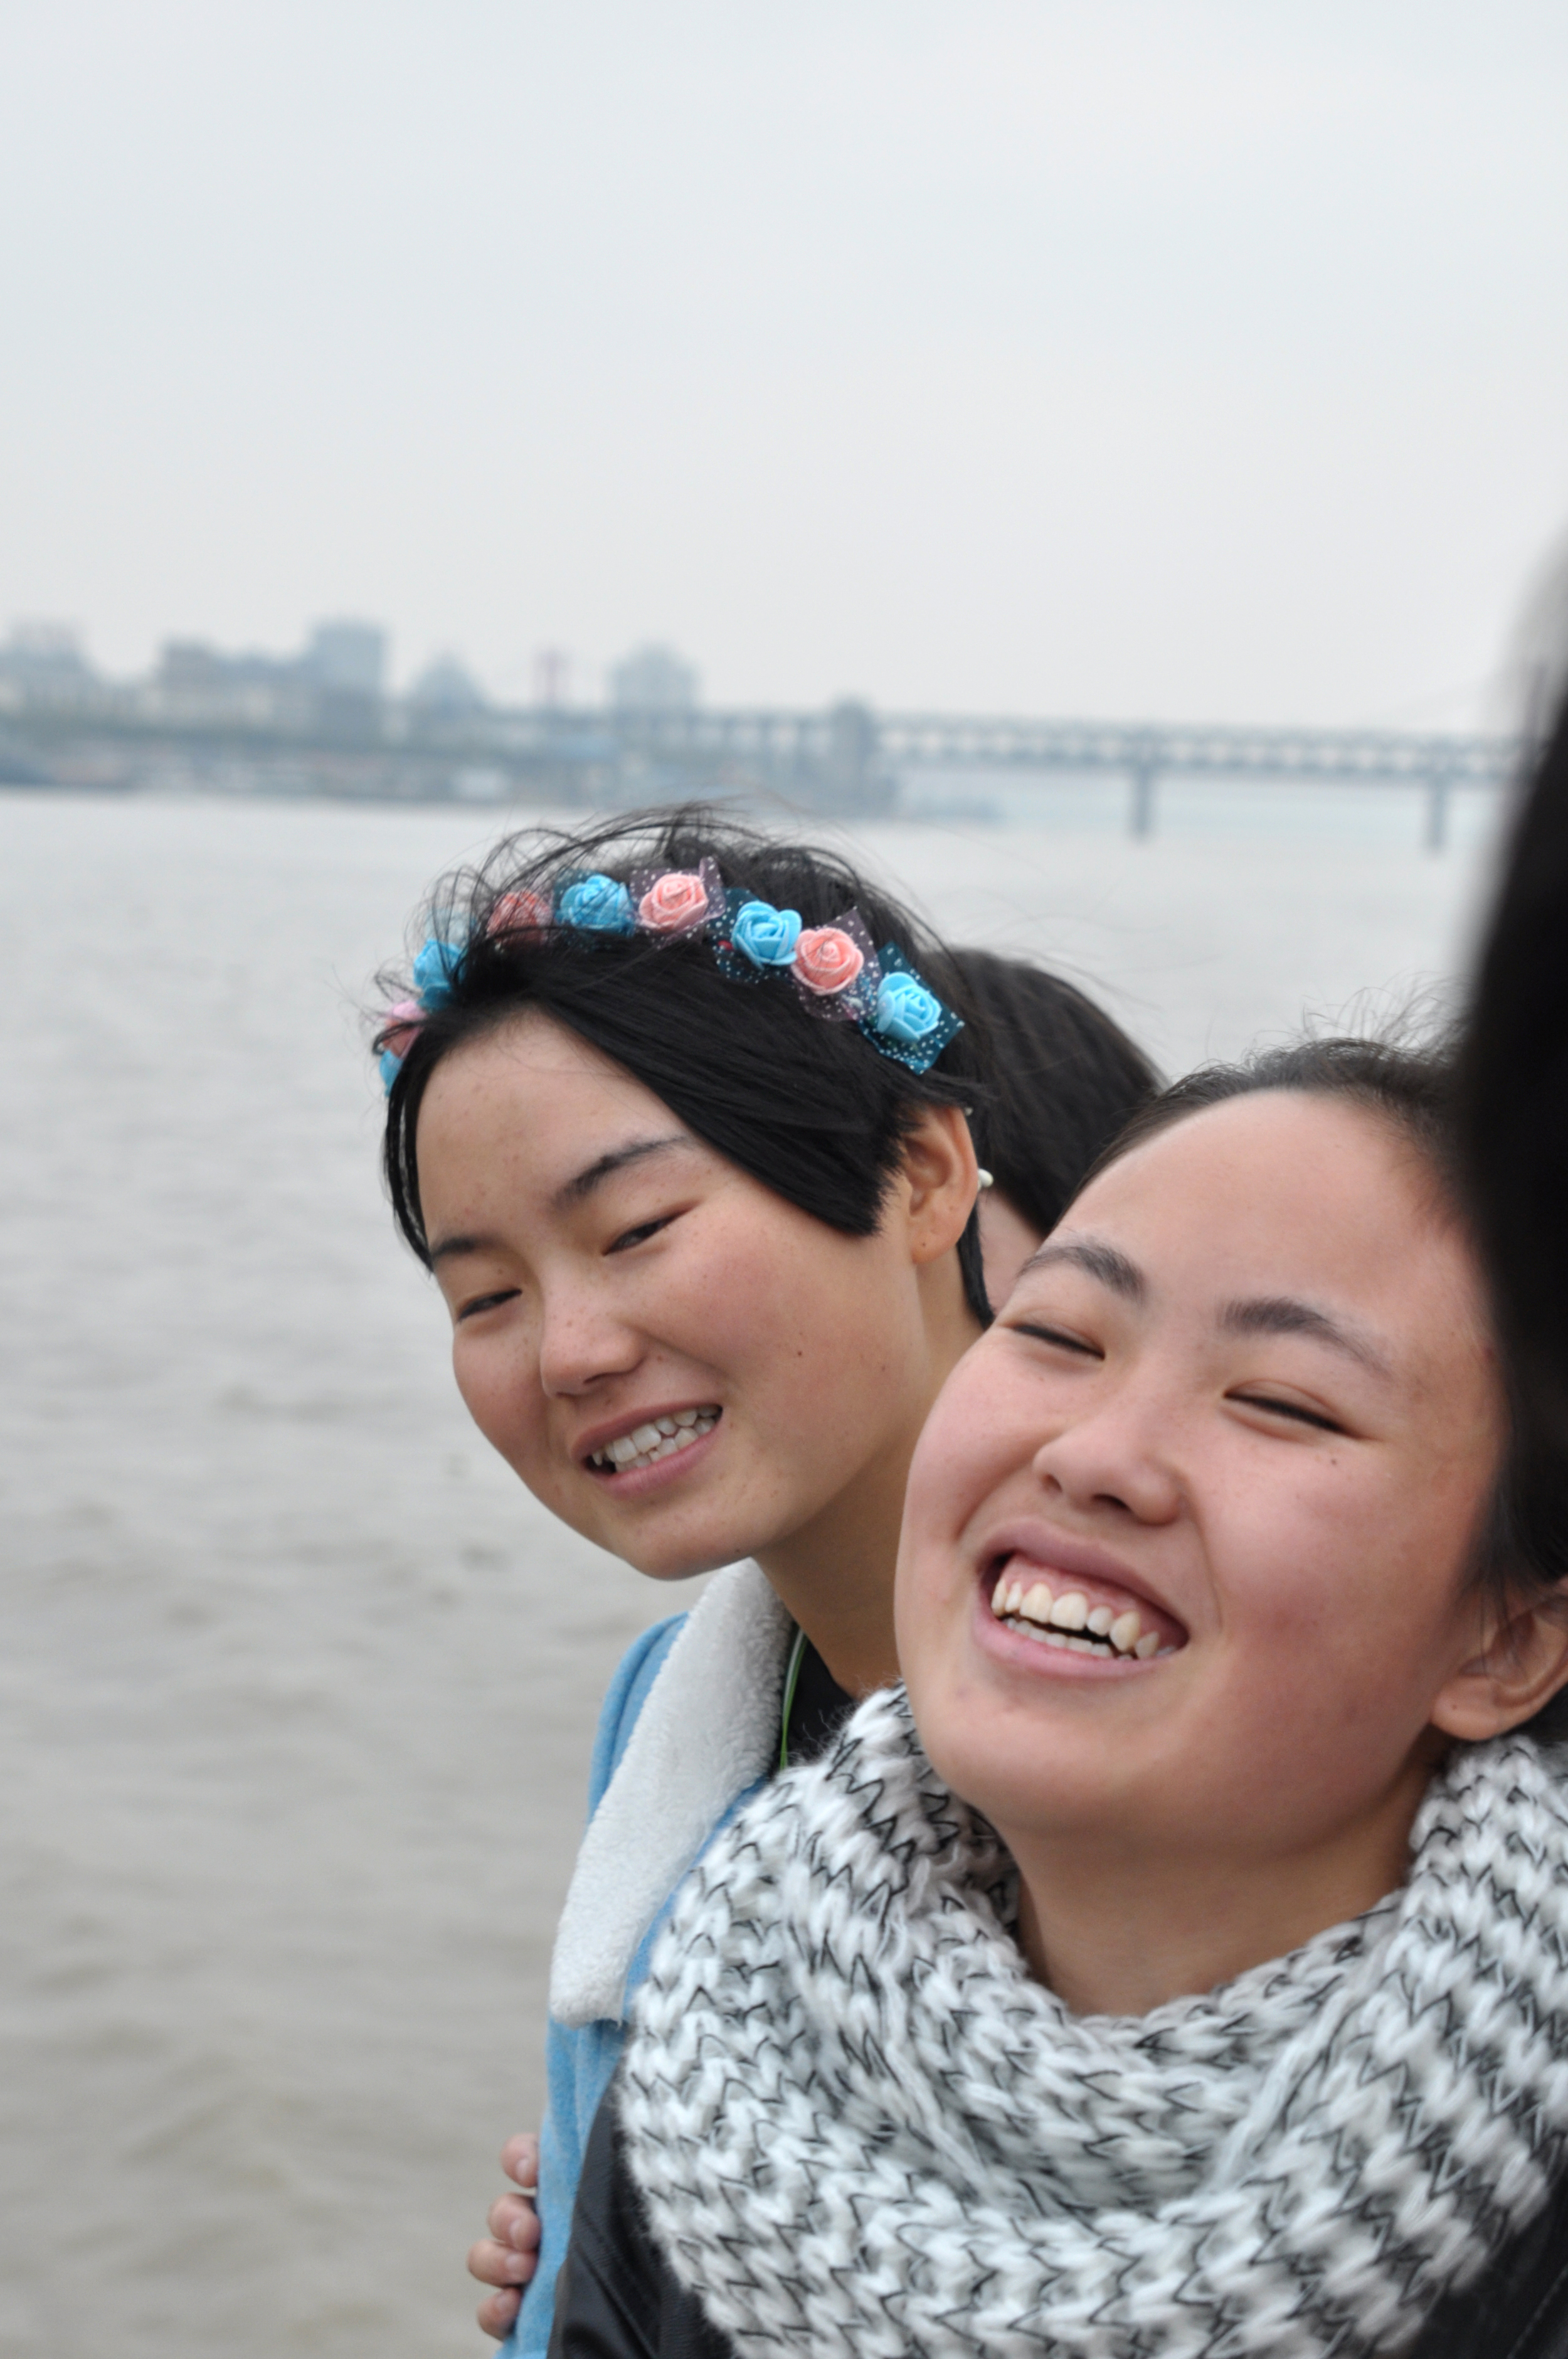 Ferry crossing the Yangtze River